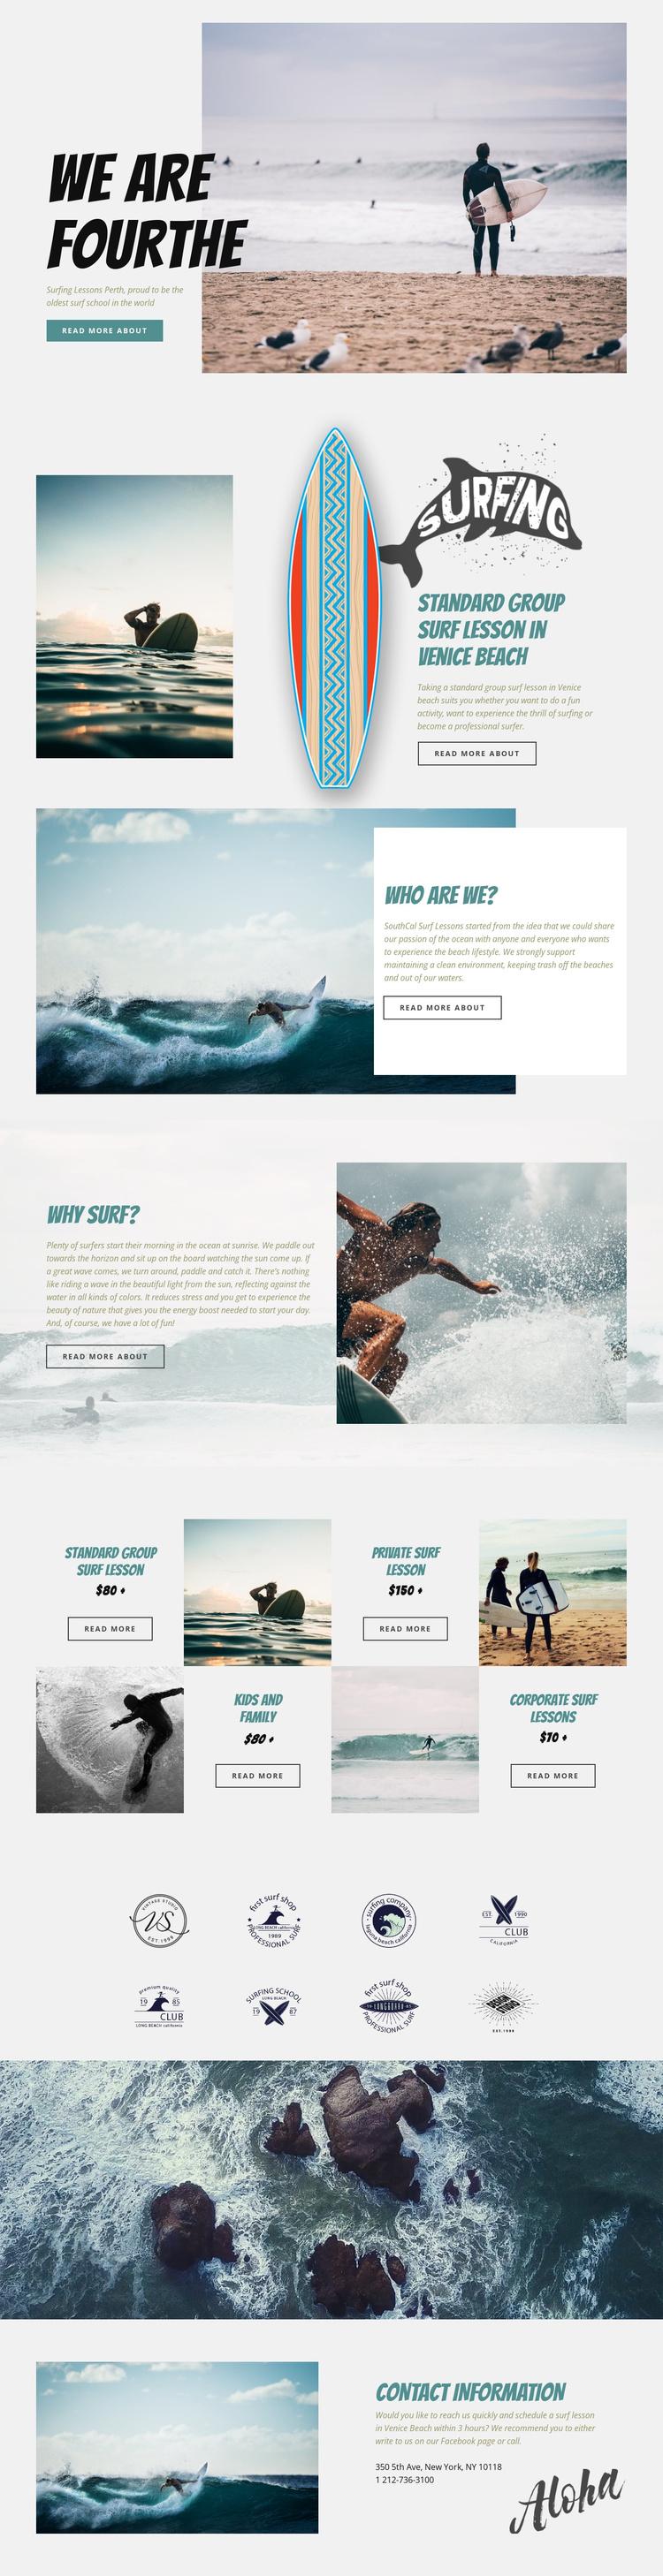 Surfing Joomla Template